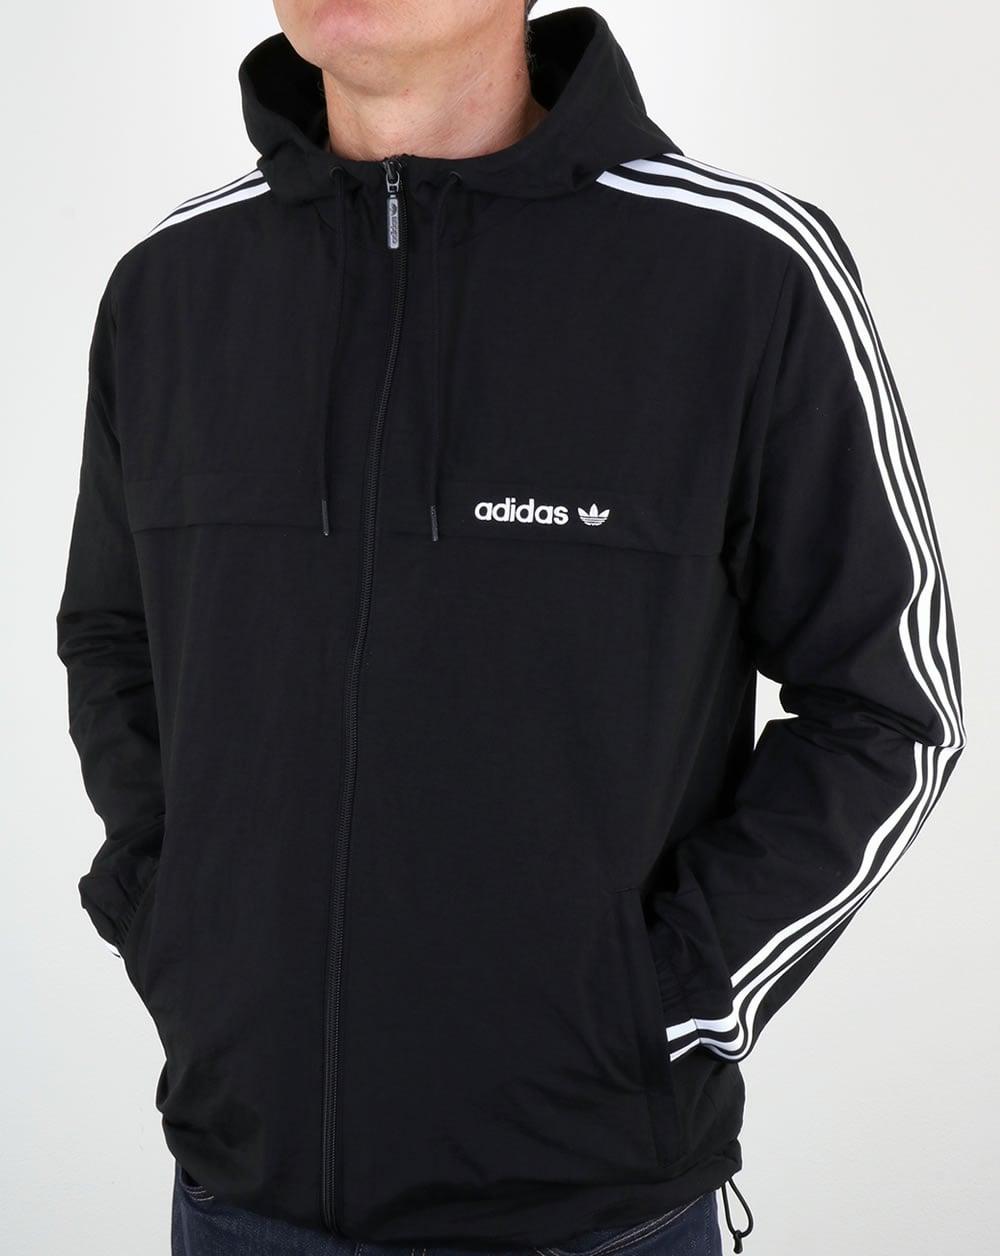 adidas sweatshirt 3 stripe